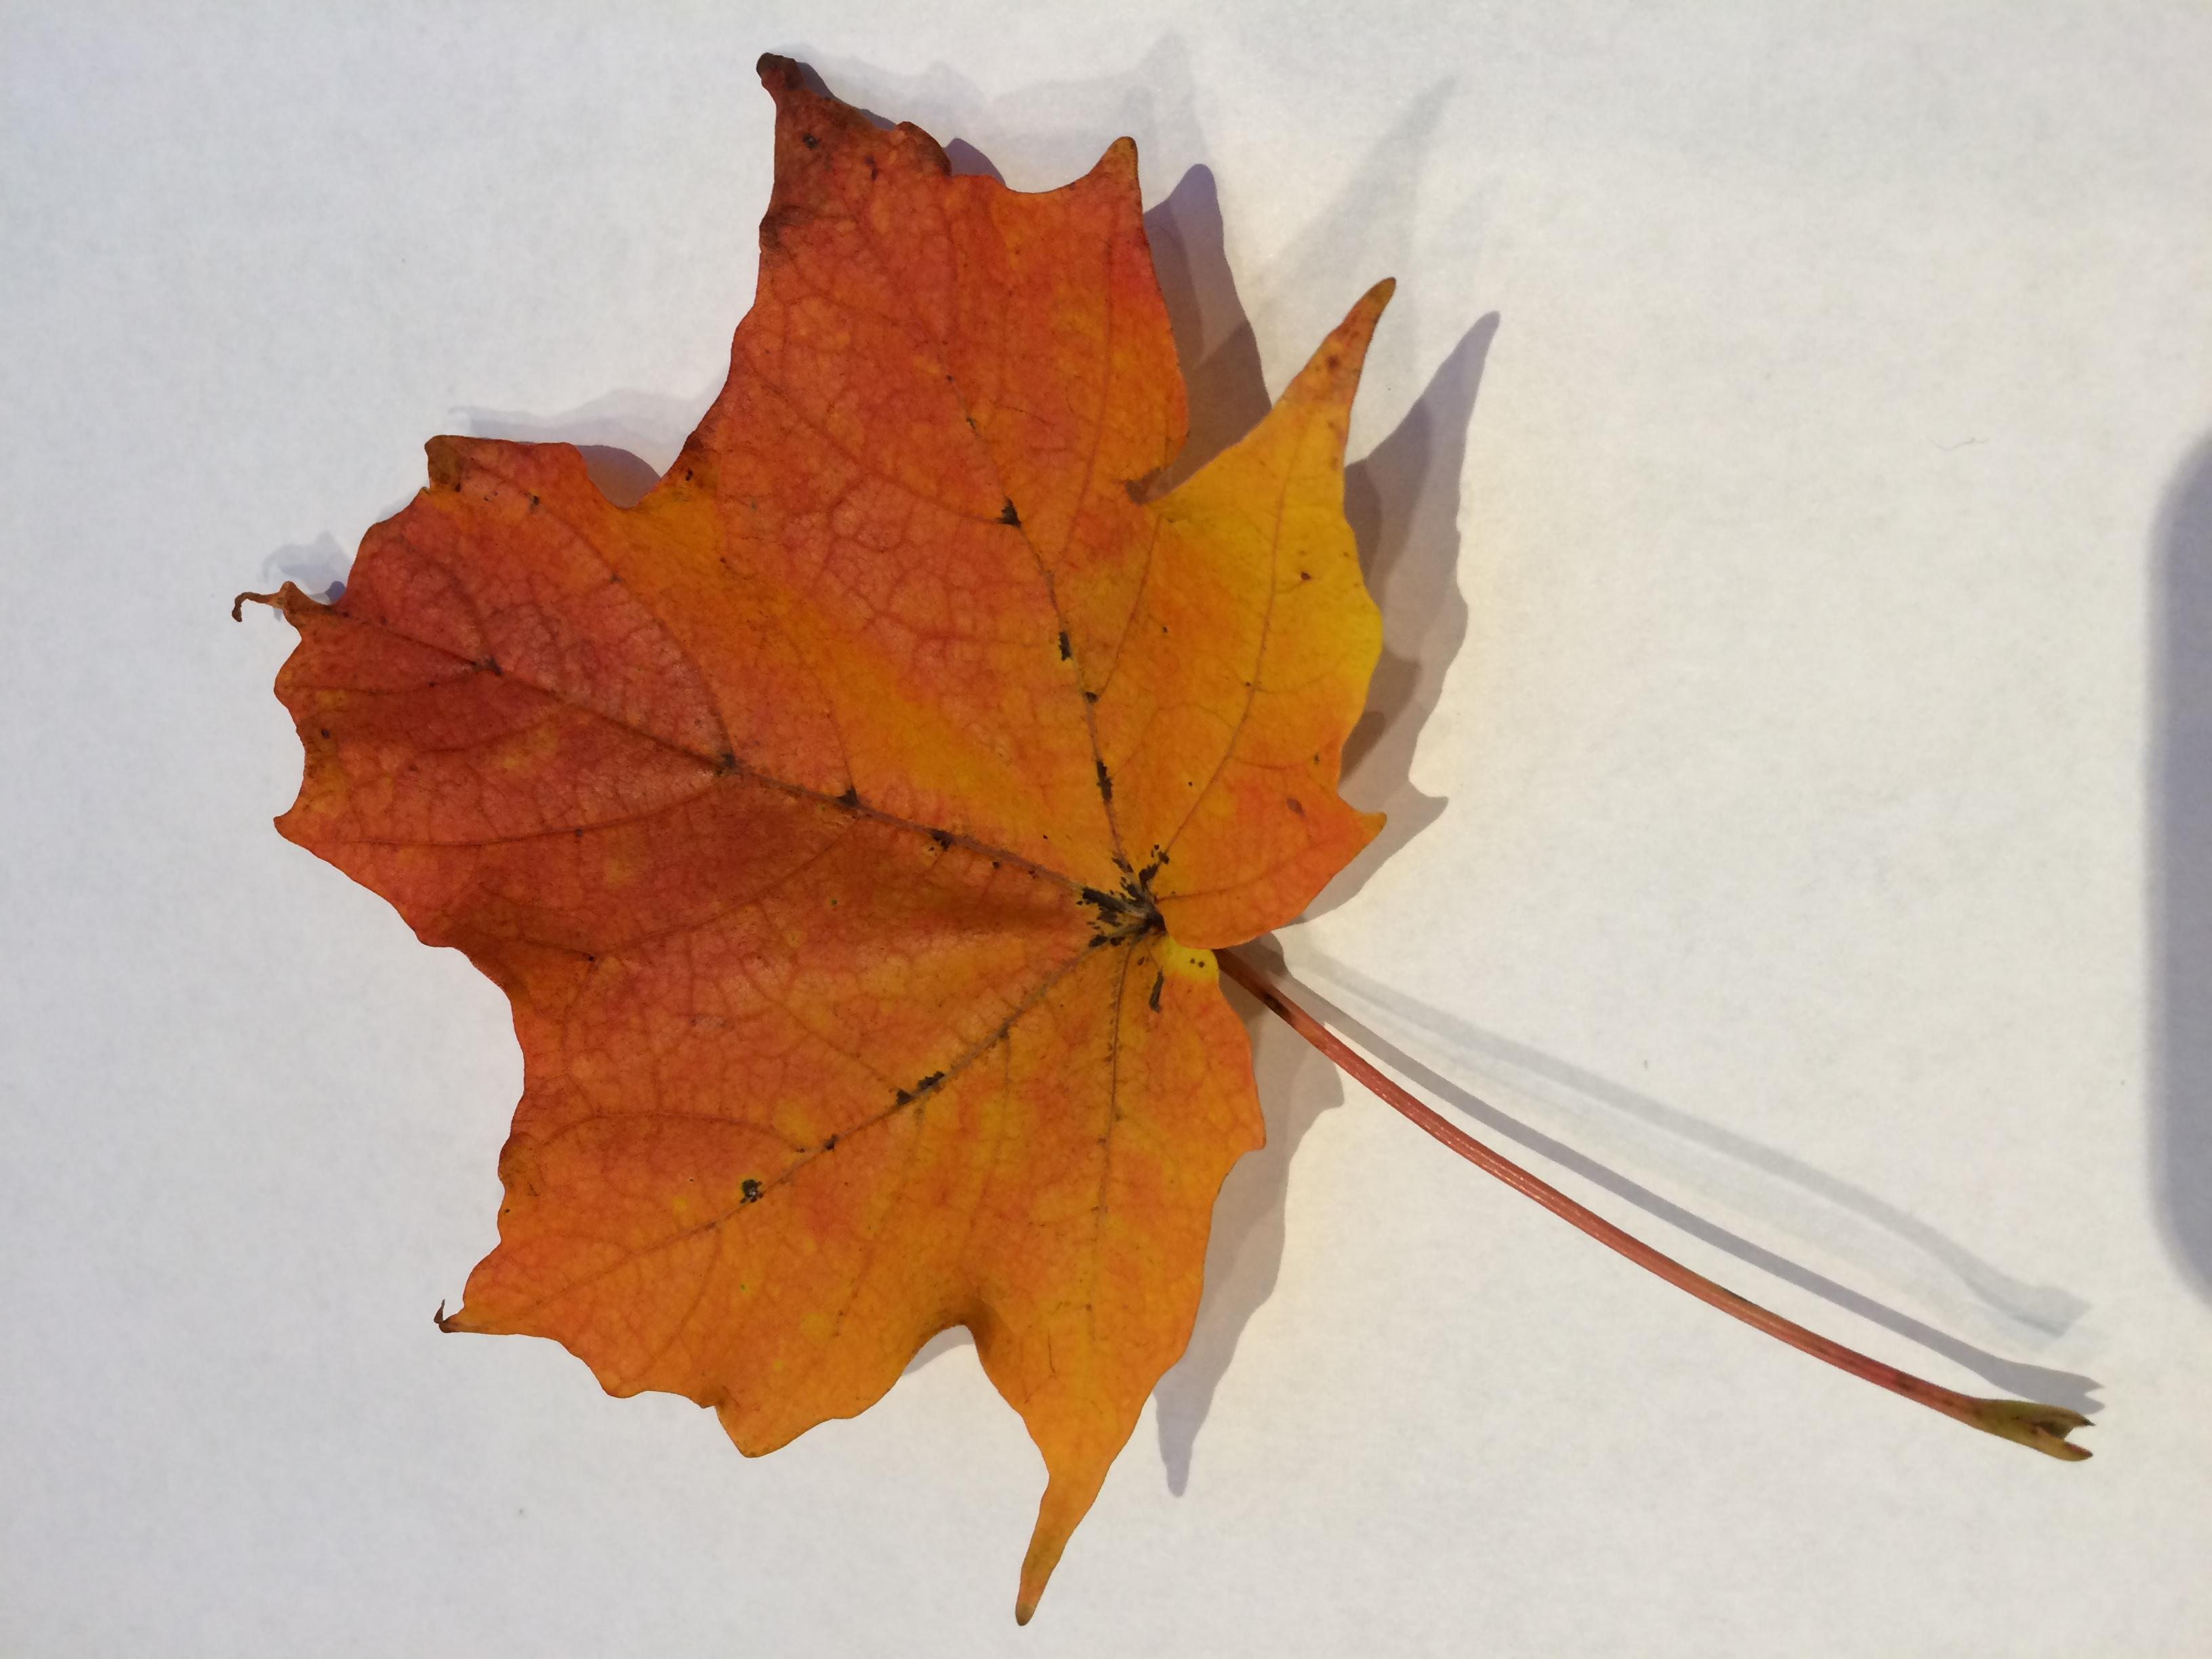 gwl/static/gwl/images/new-leaves/red-3.jpg